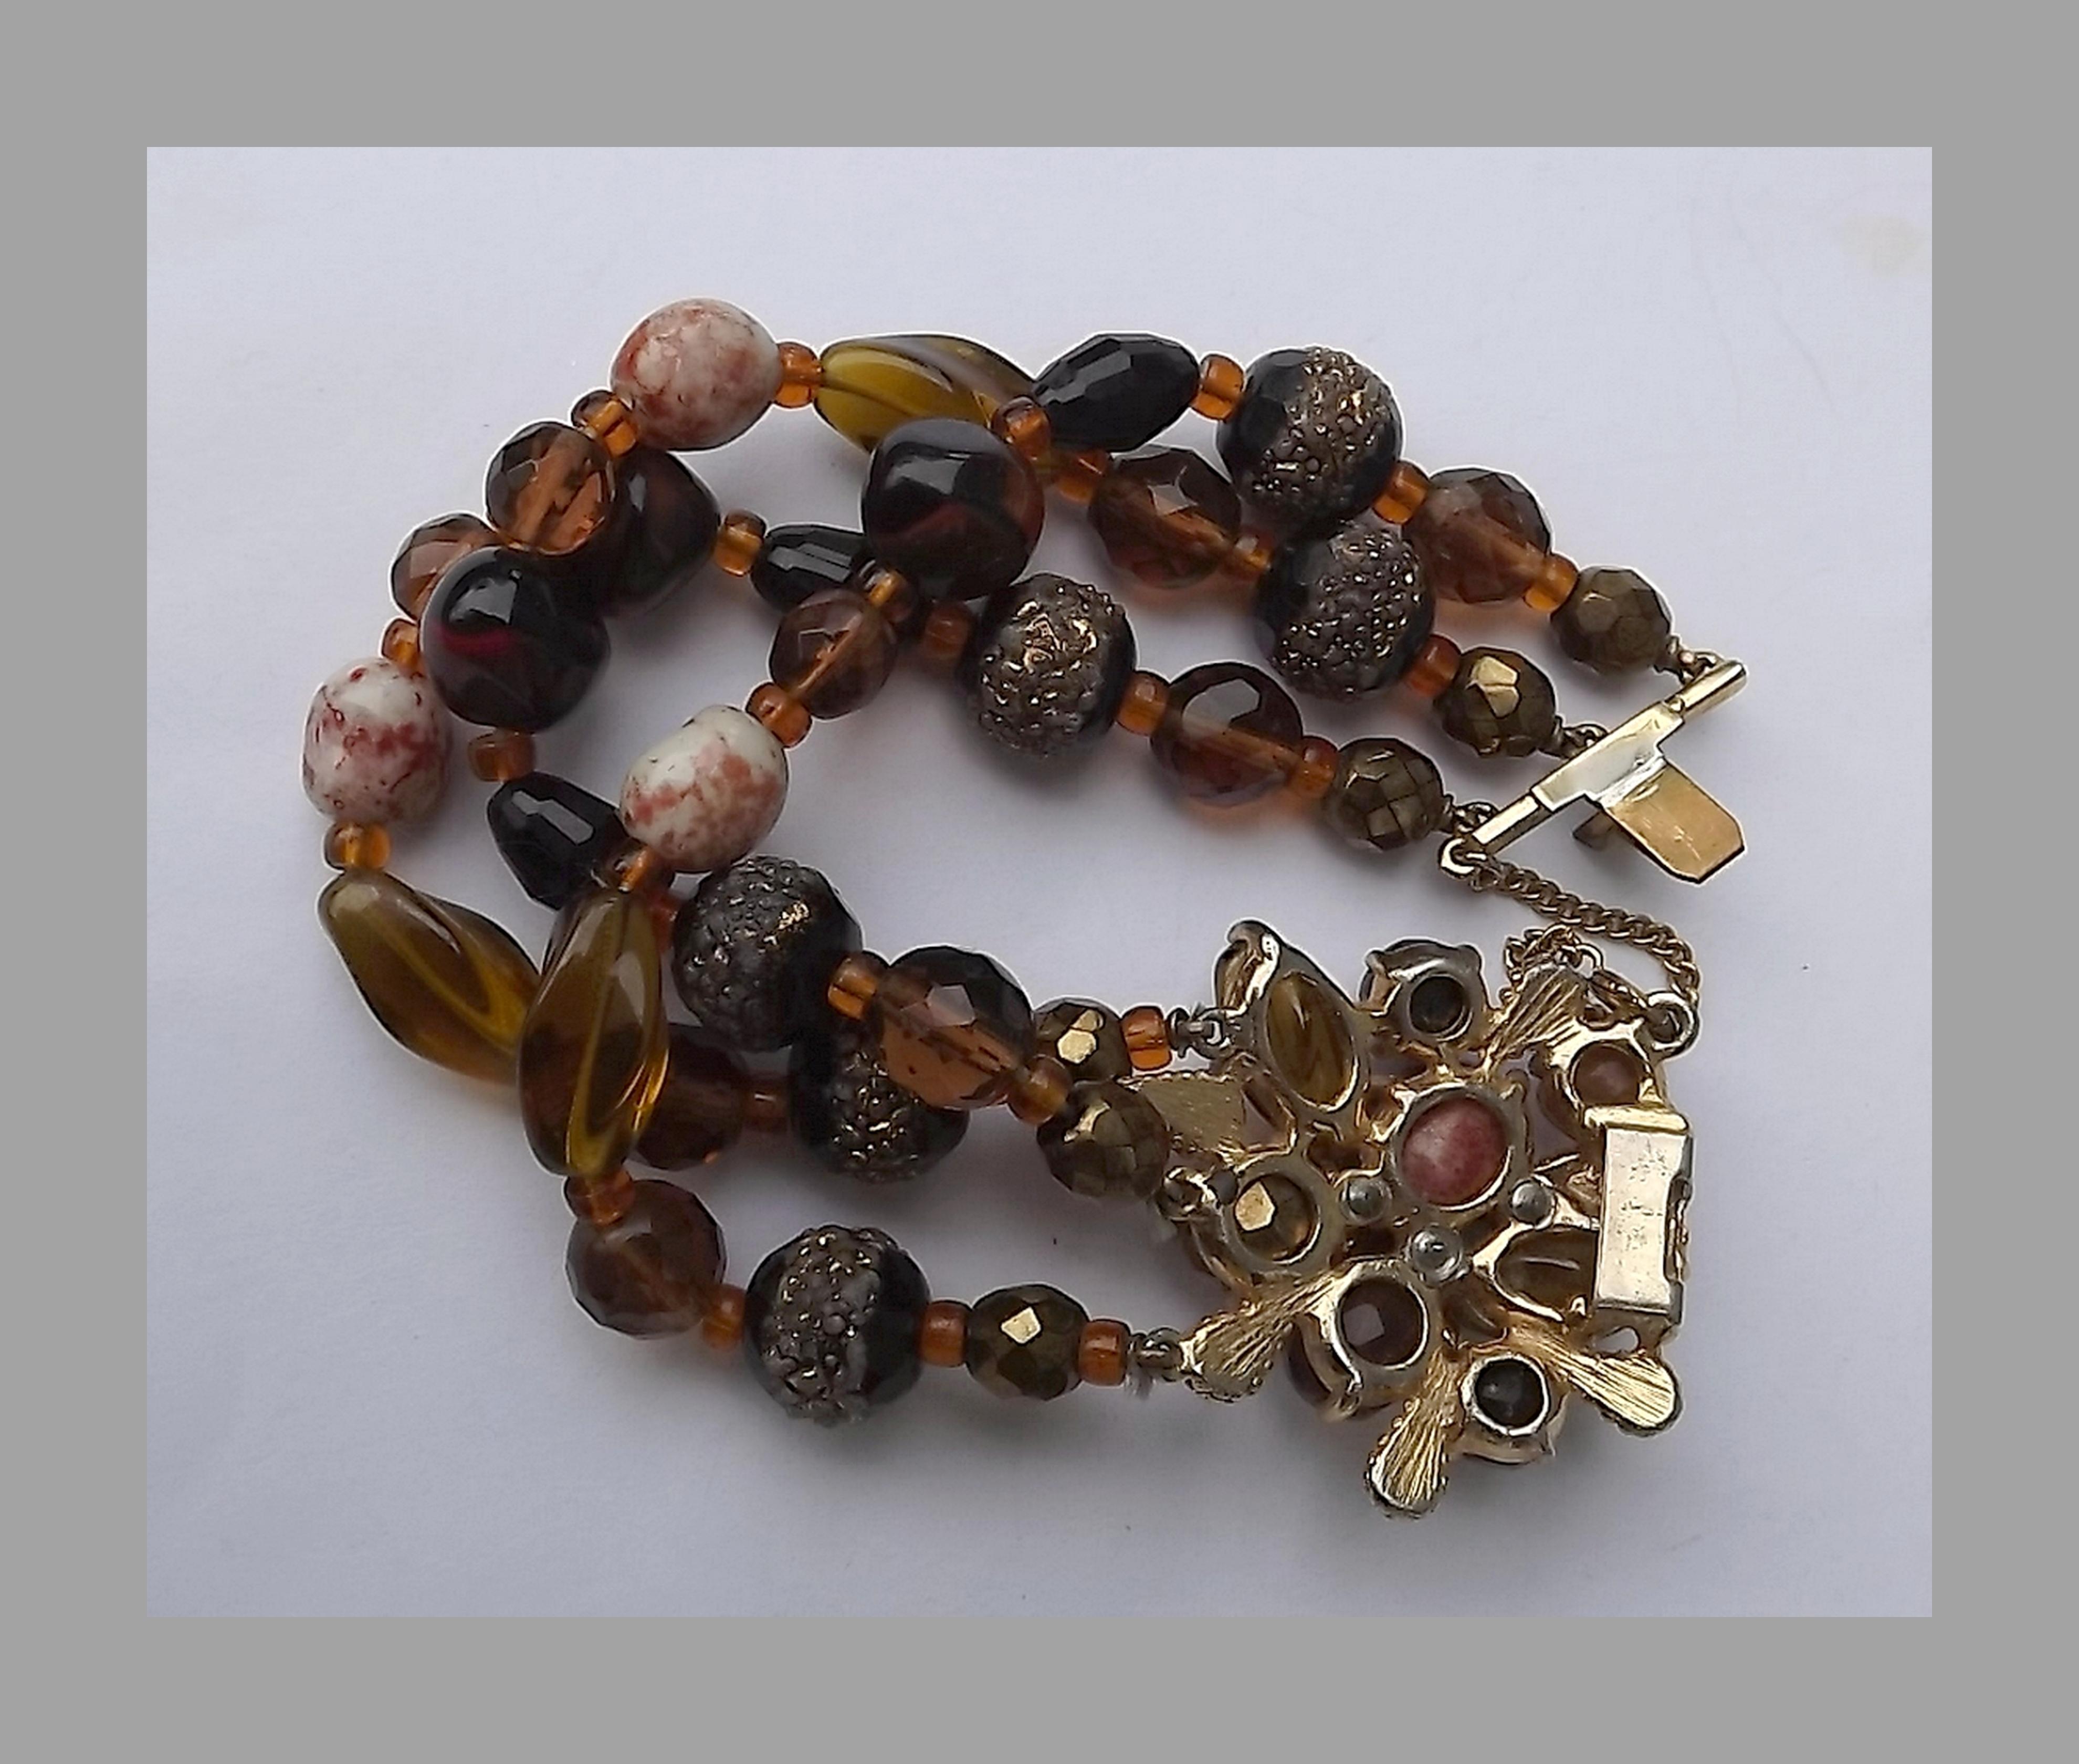 Iridescent Beads on Brown 5-Strand Bracelet